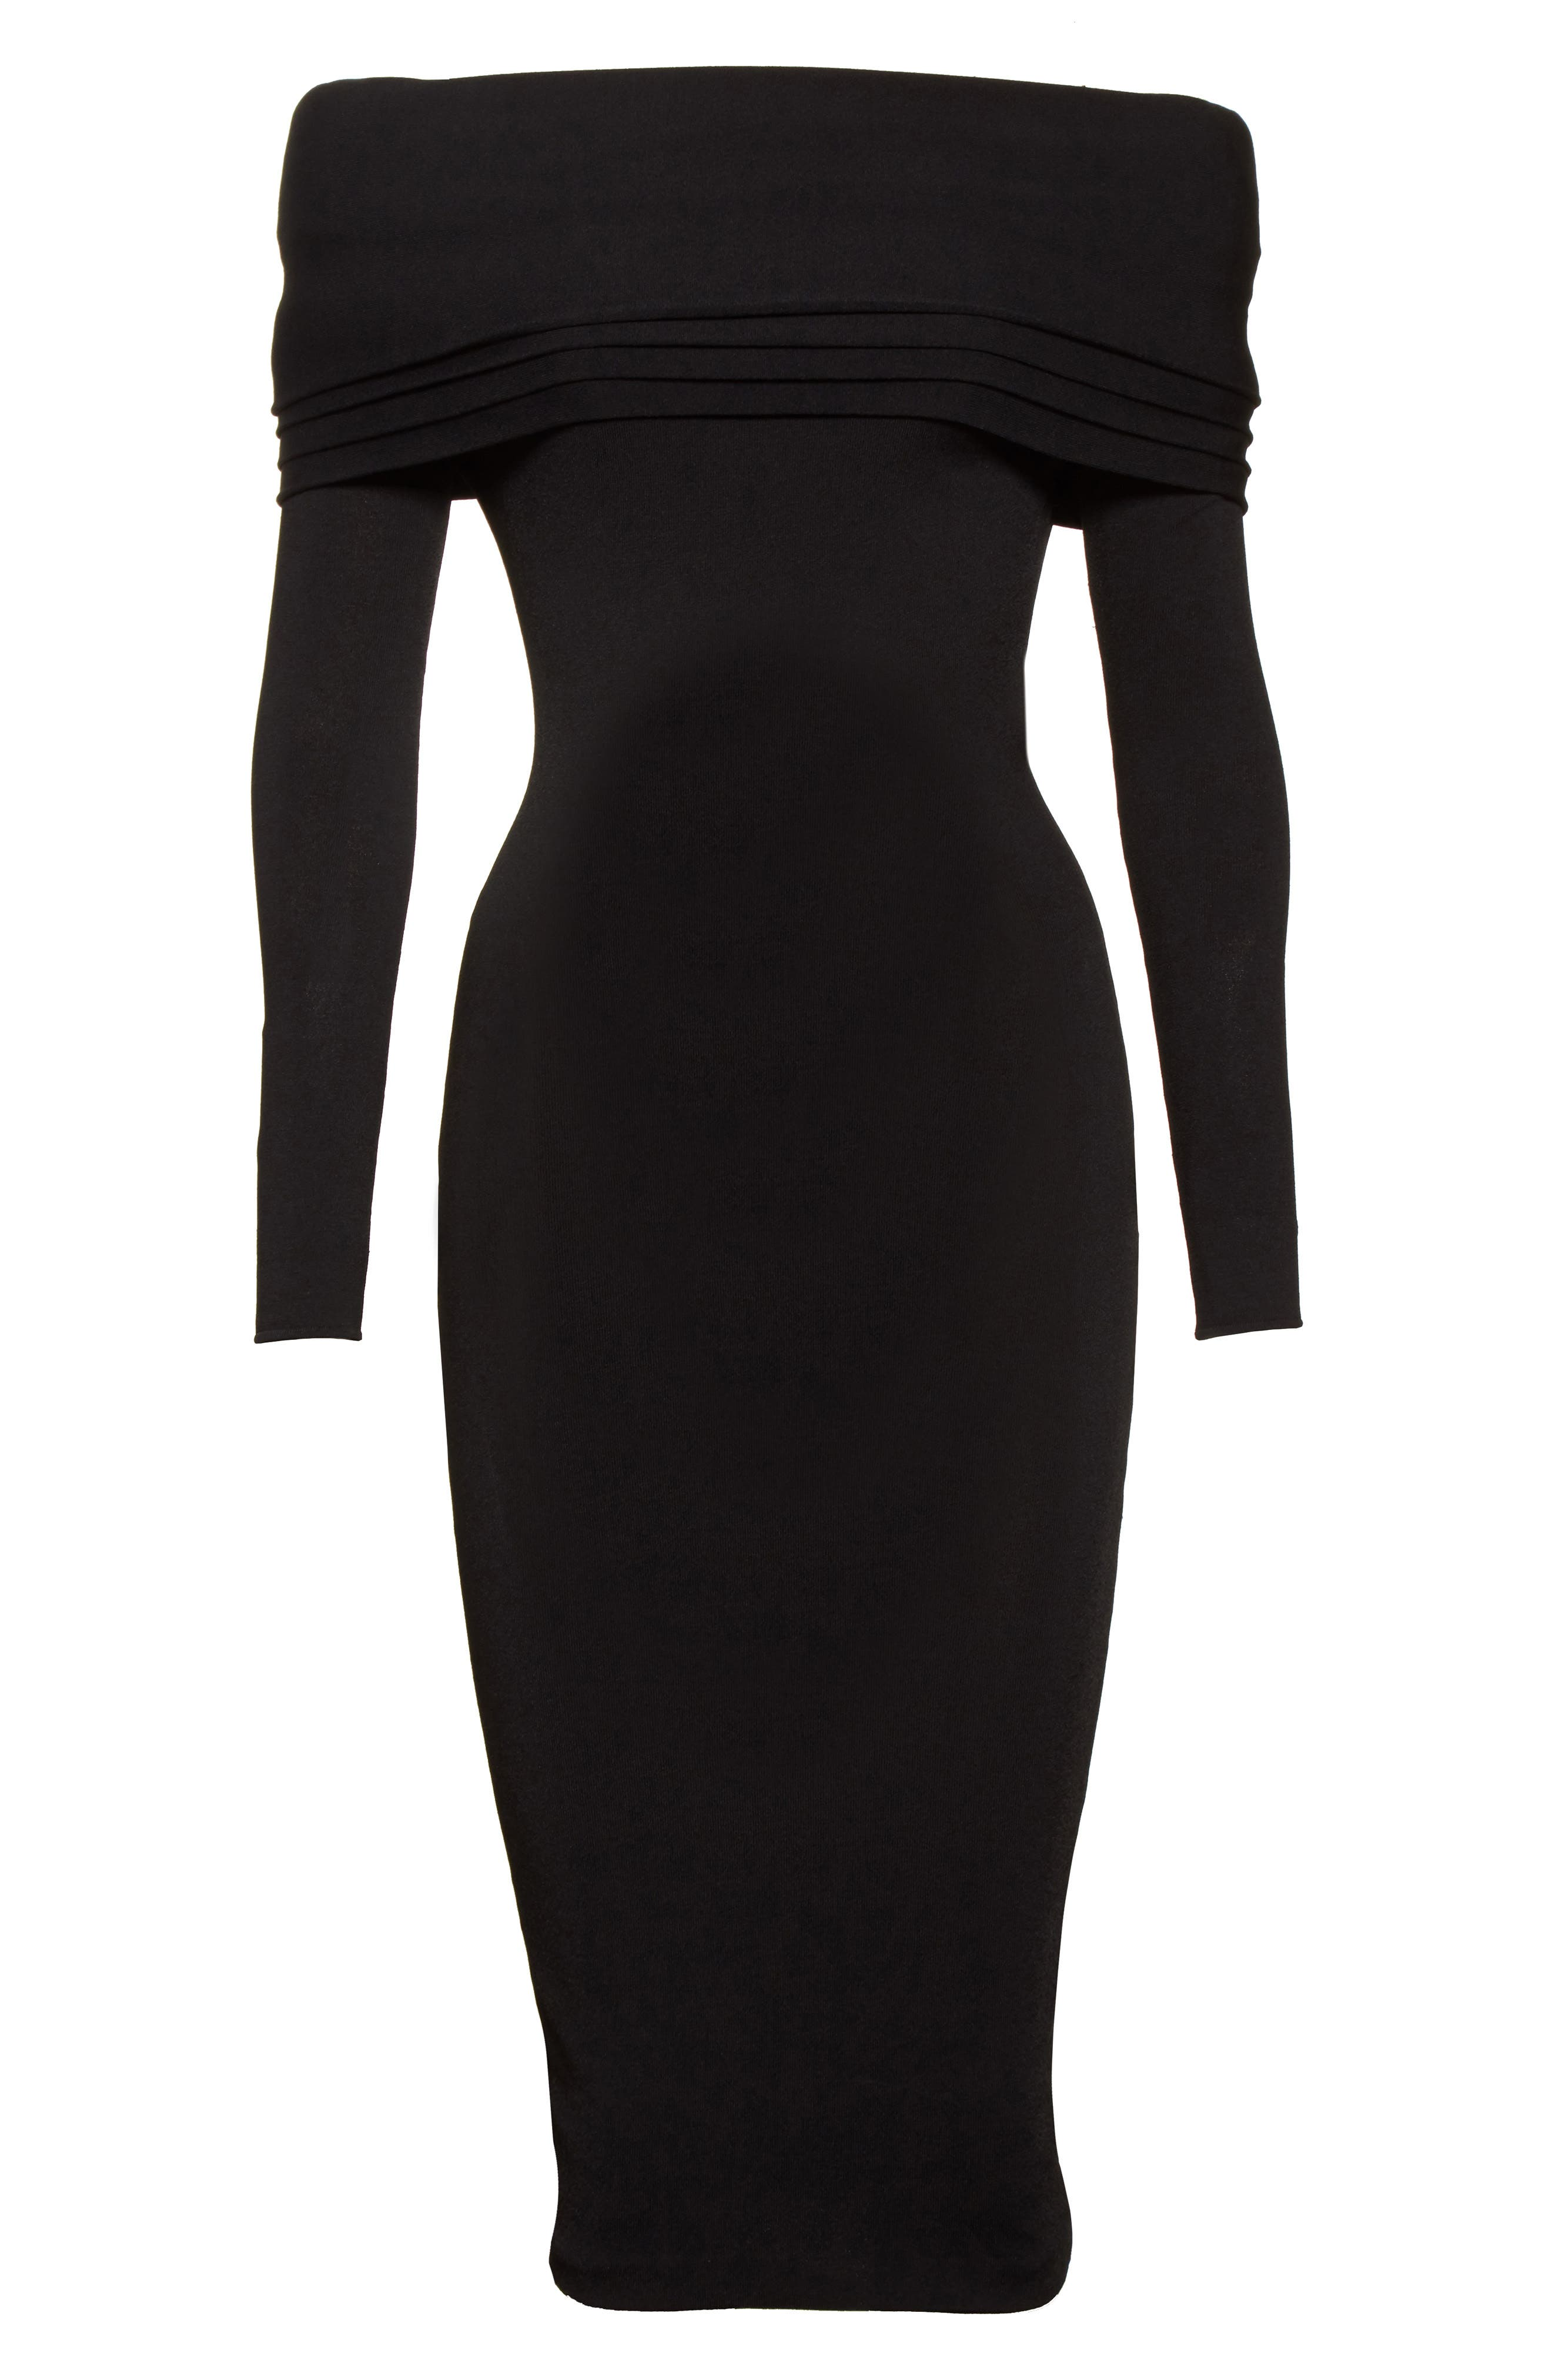 Layered Knit Off the Shoulder Dress,                             Alternate thumbnail 6, color,                             Black